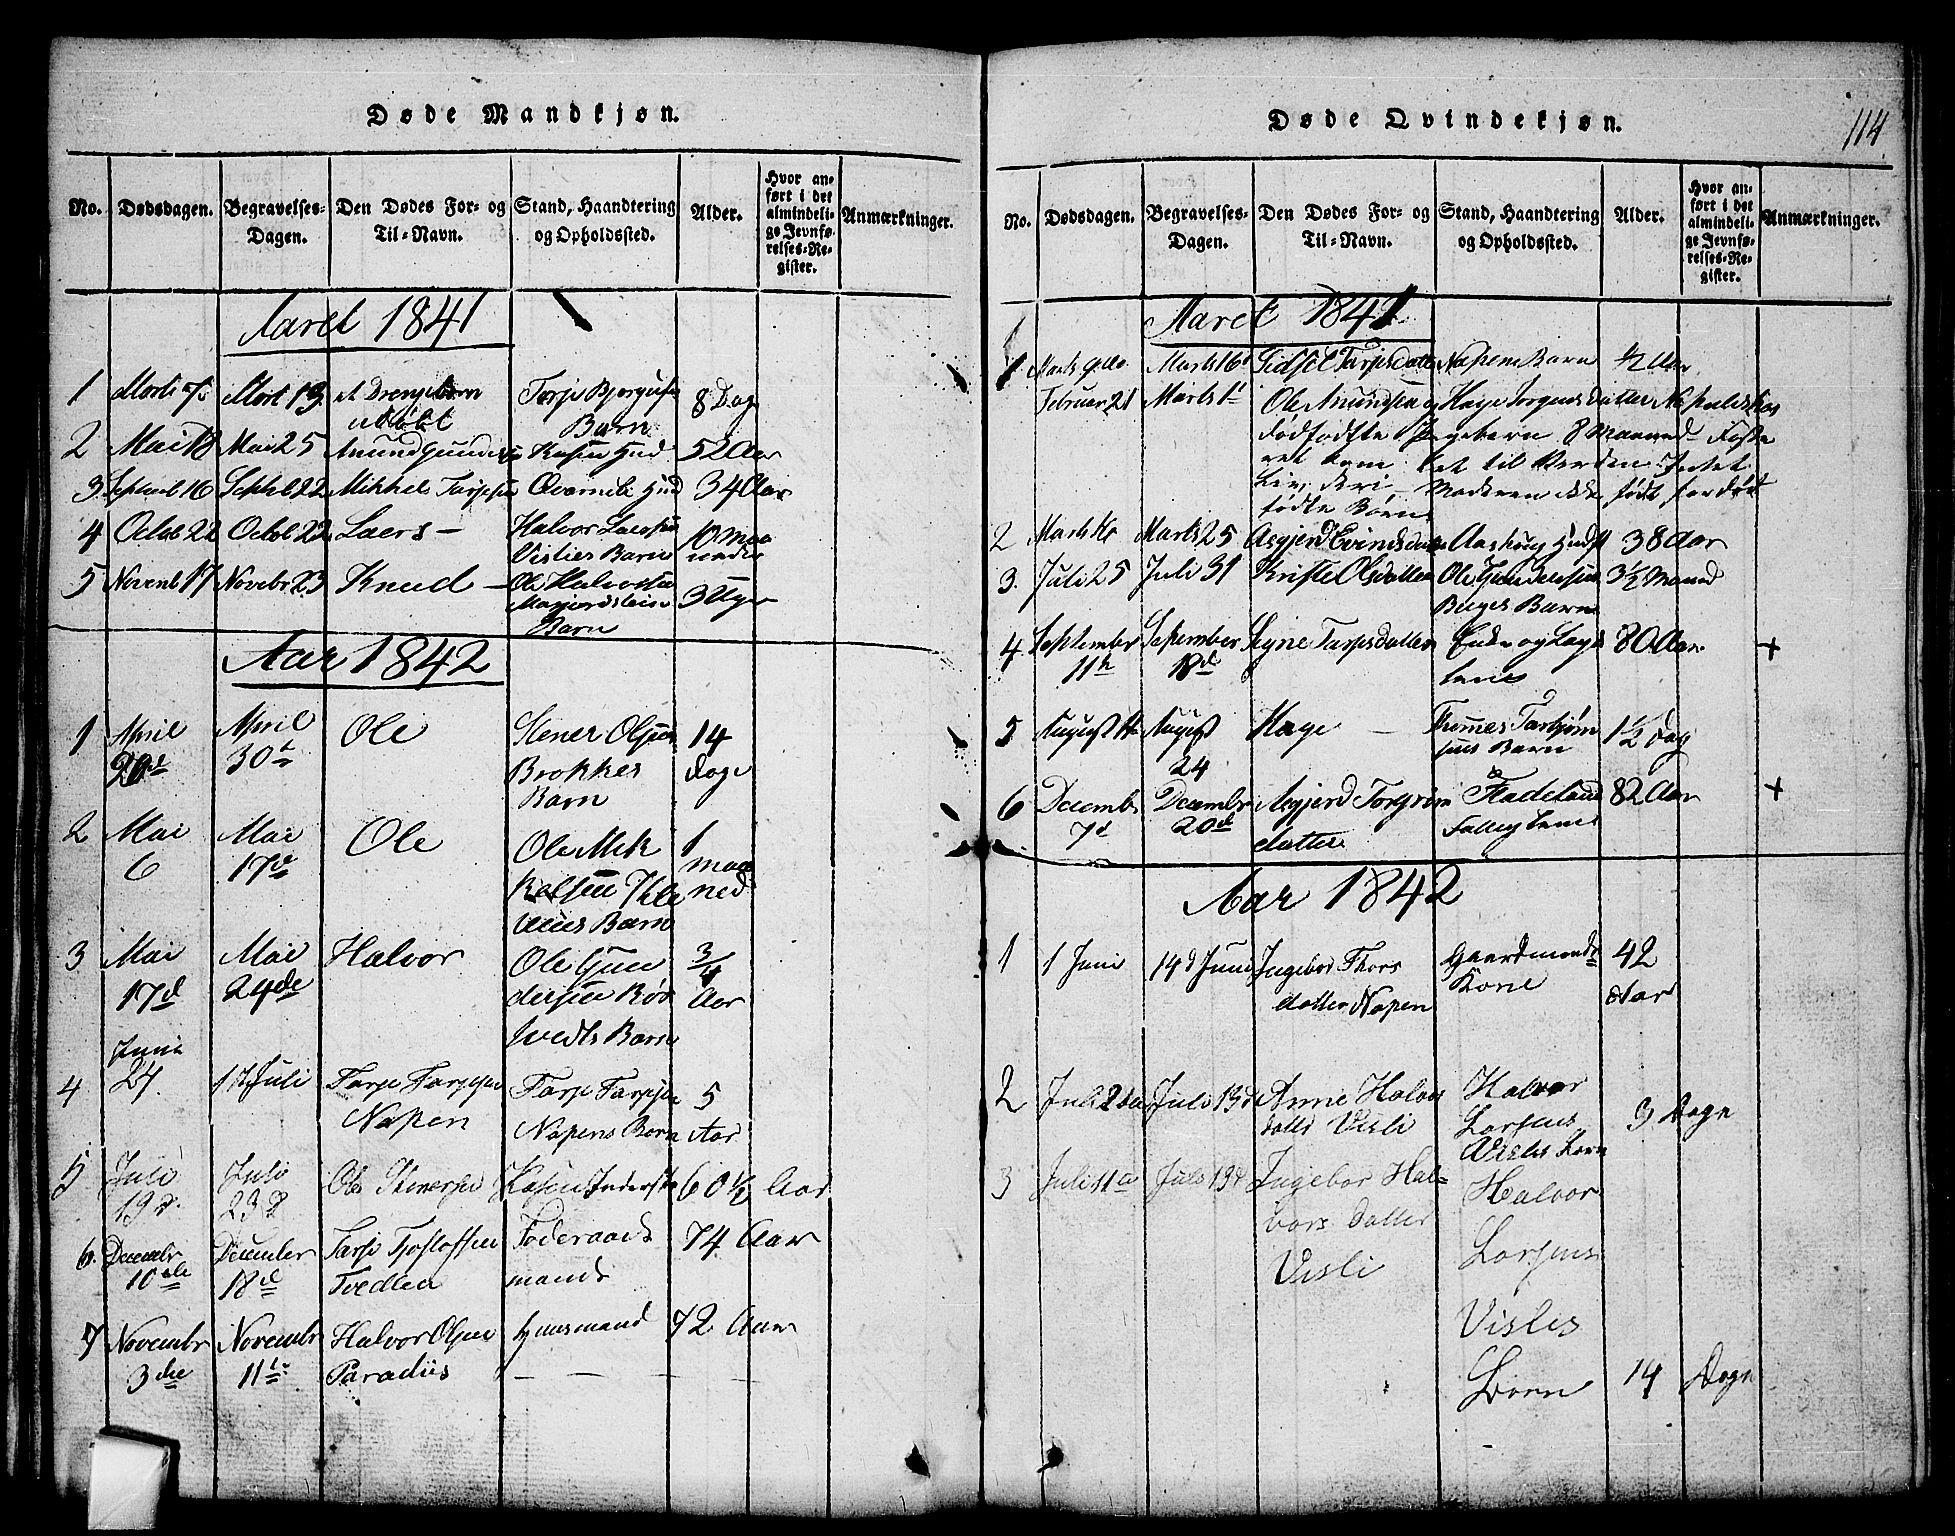 SAKO, Mo kirkebøker, G/Gb/L0001: Klokkerbok nr. II 1, 1814-1843, s. 114